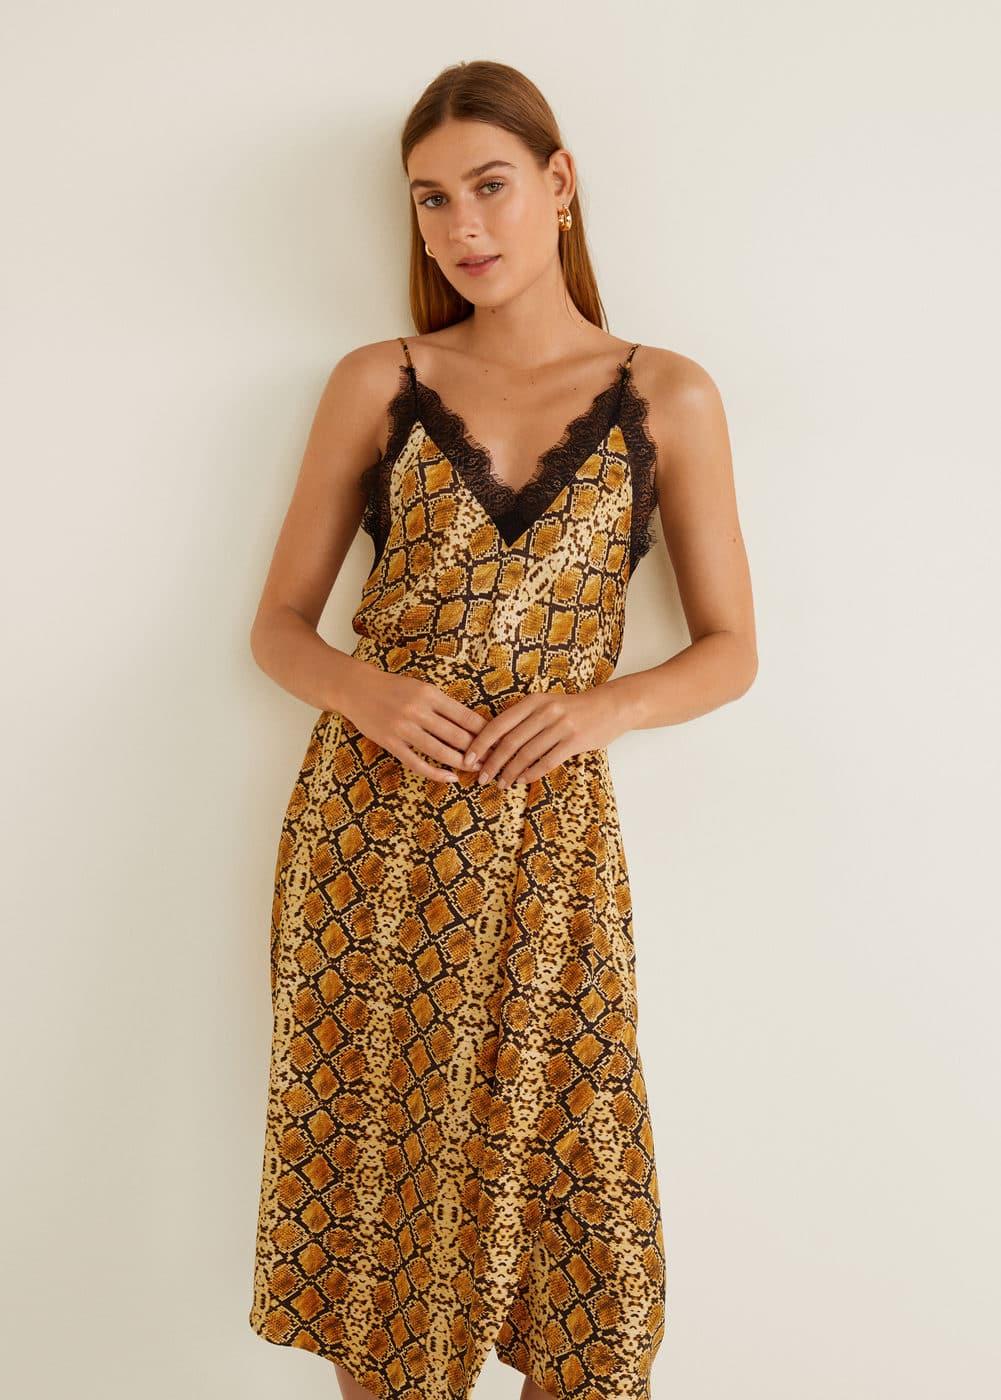 Snake print skirt -  Woman | OUTLET Latvia